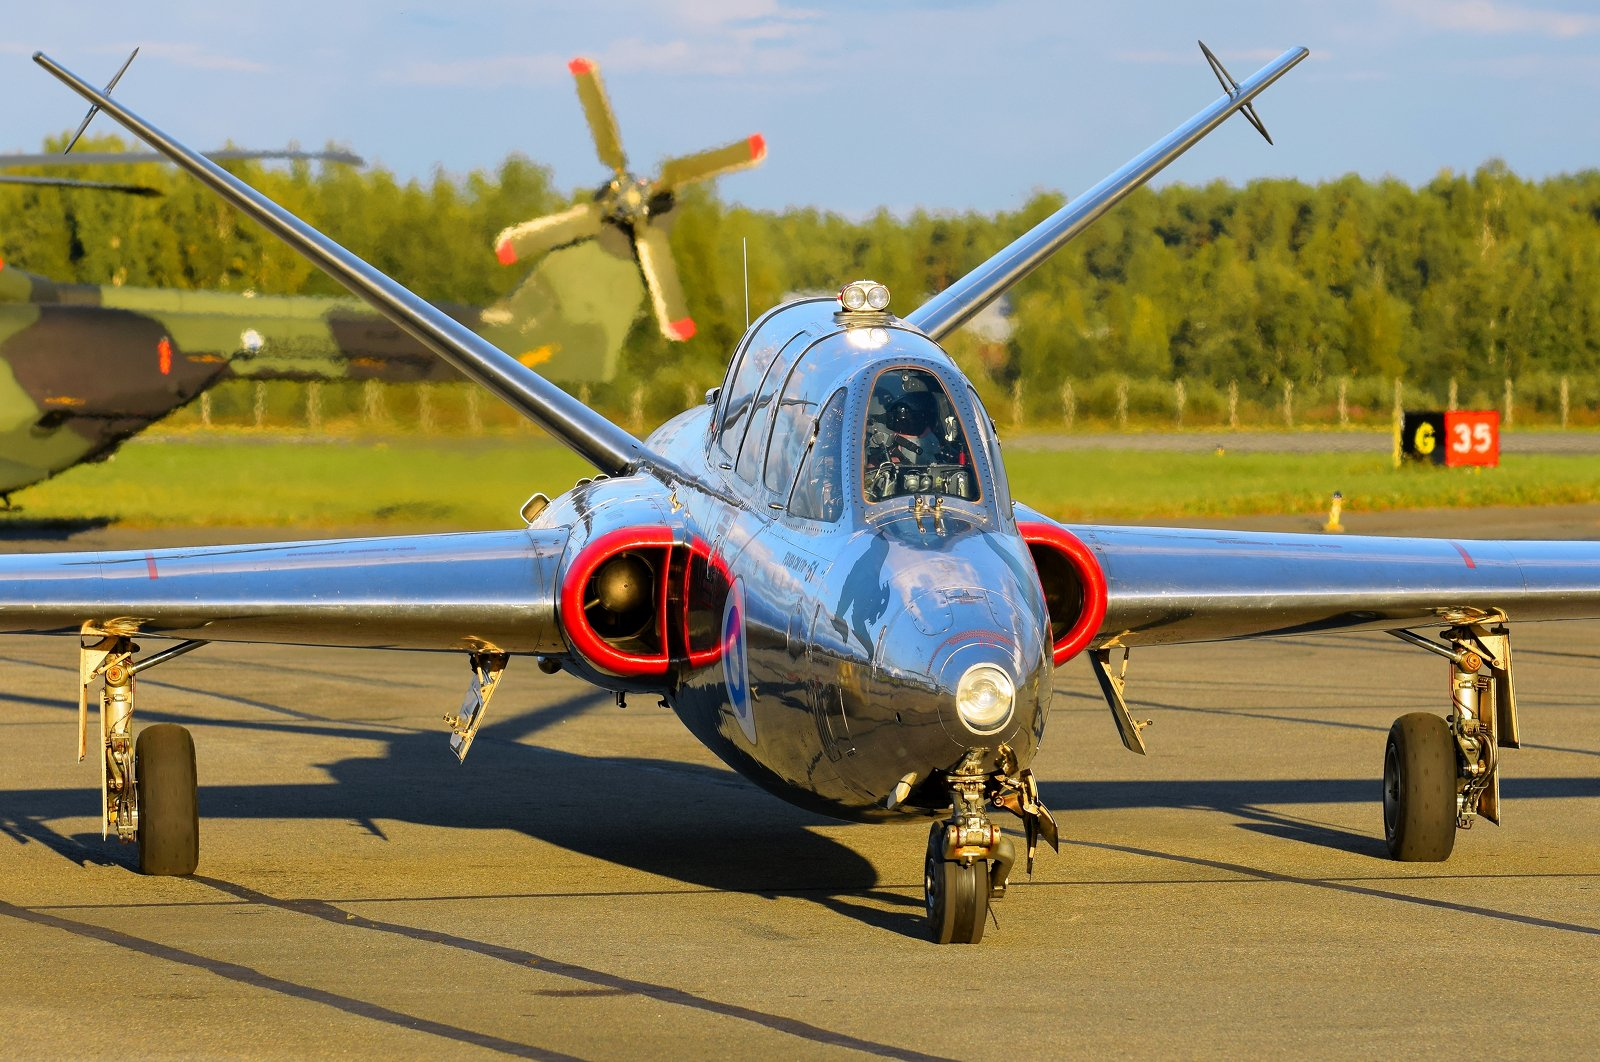 OH-FMM - Fouga CM.170 Magister - 29.8.2020